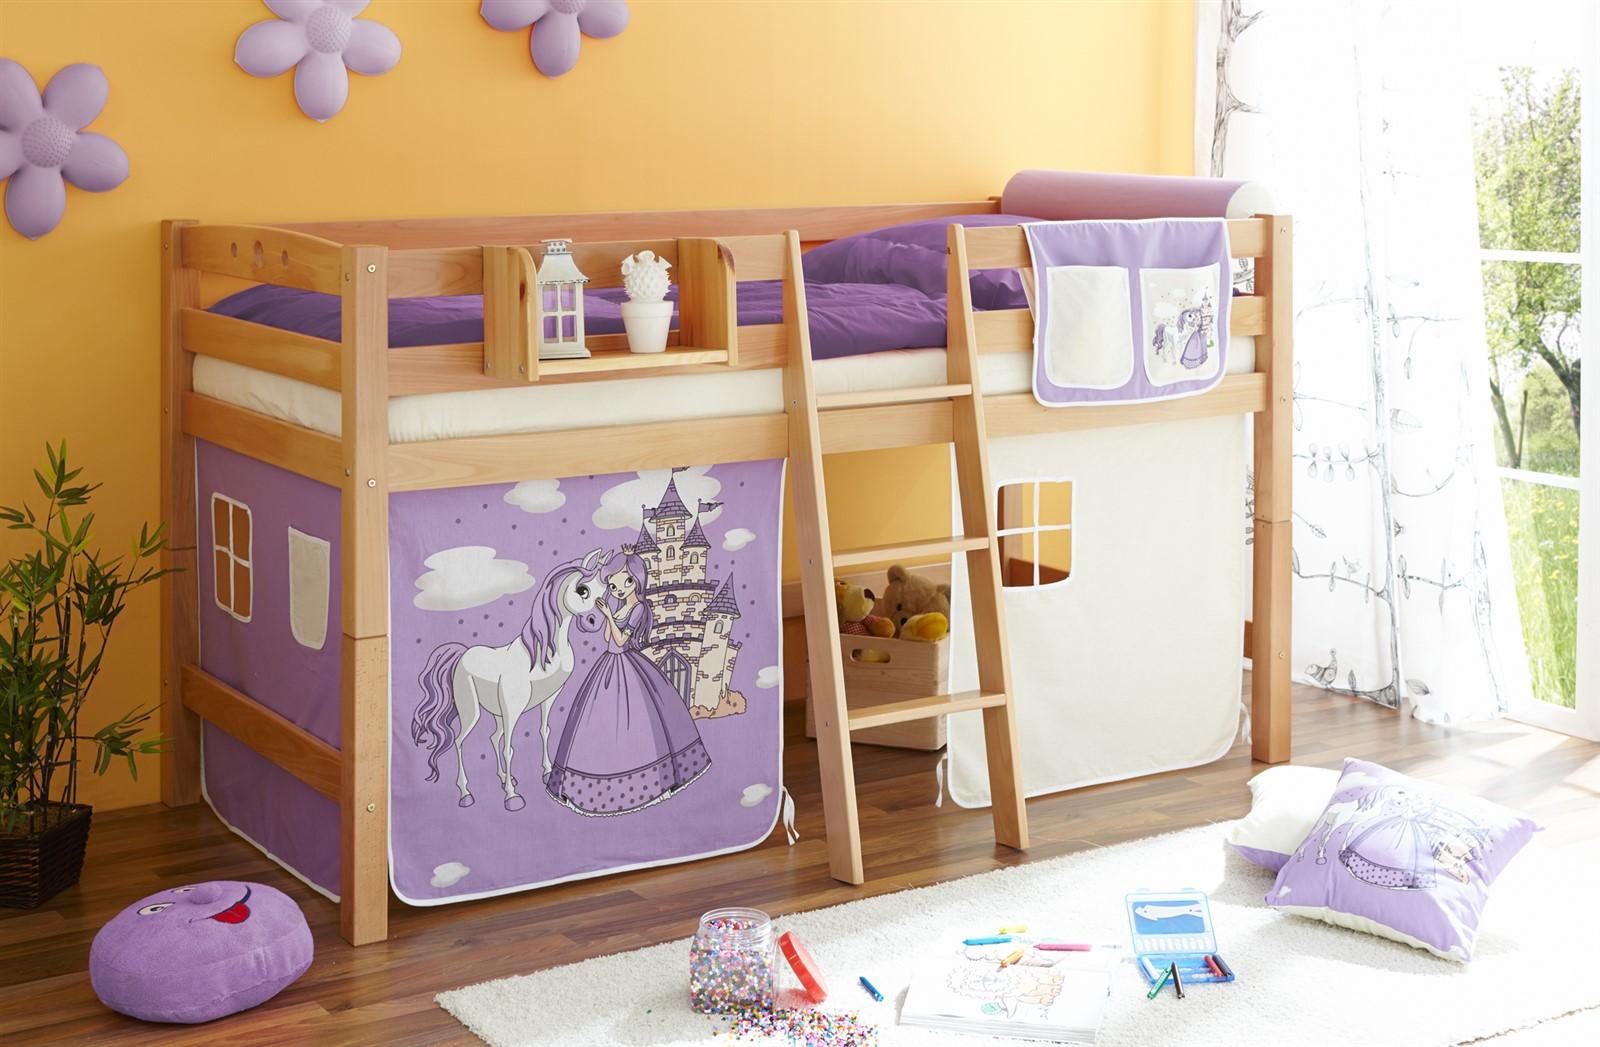 mezzanine de lit lits superpos s en oli h tre massif ebay. Black Bedroom Furniture Sets. Home Design Ideas